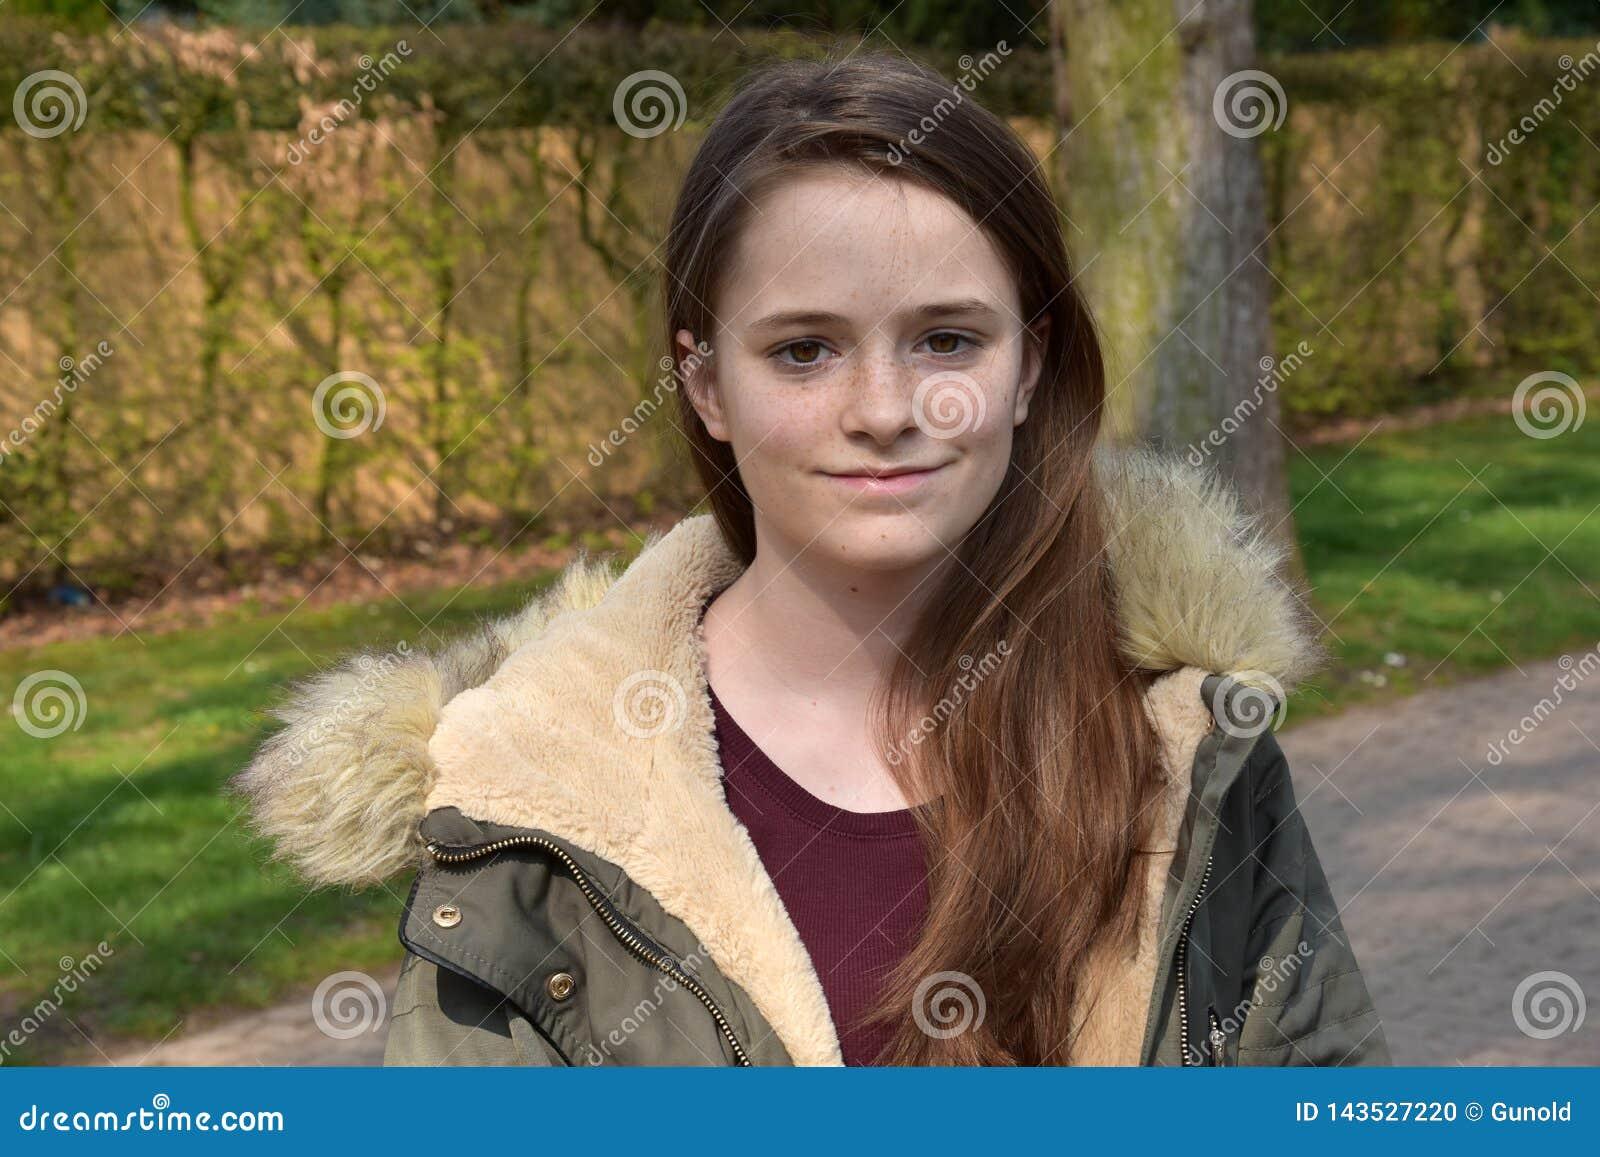 Cute teenage girl with winter jacket